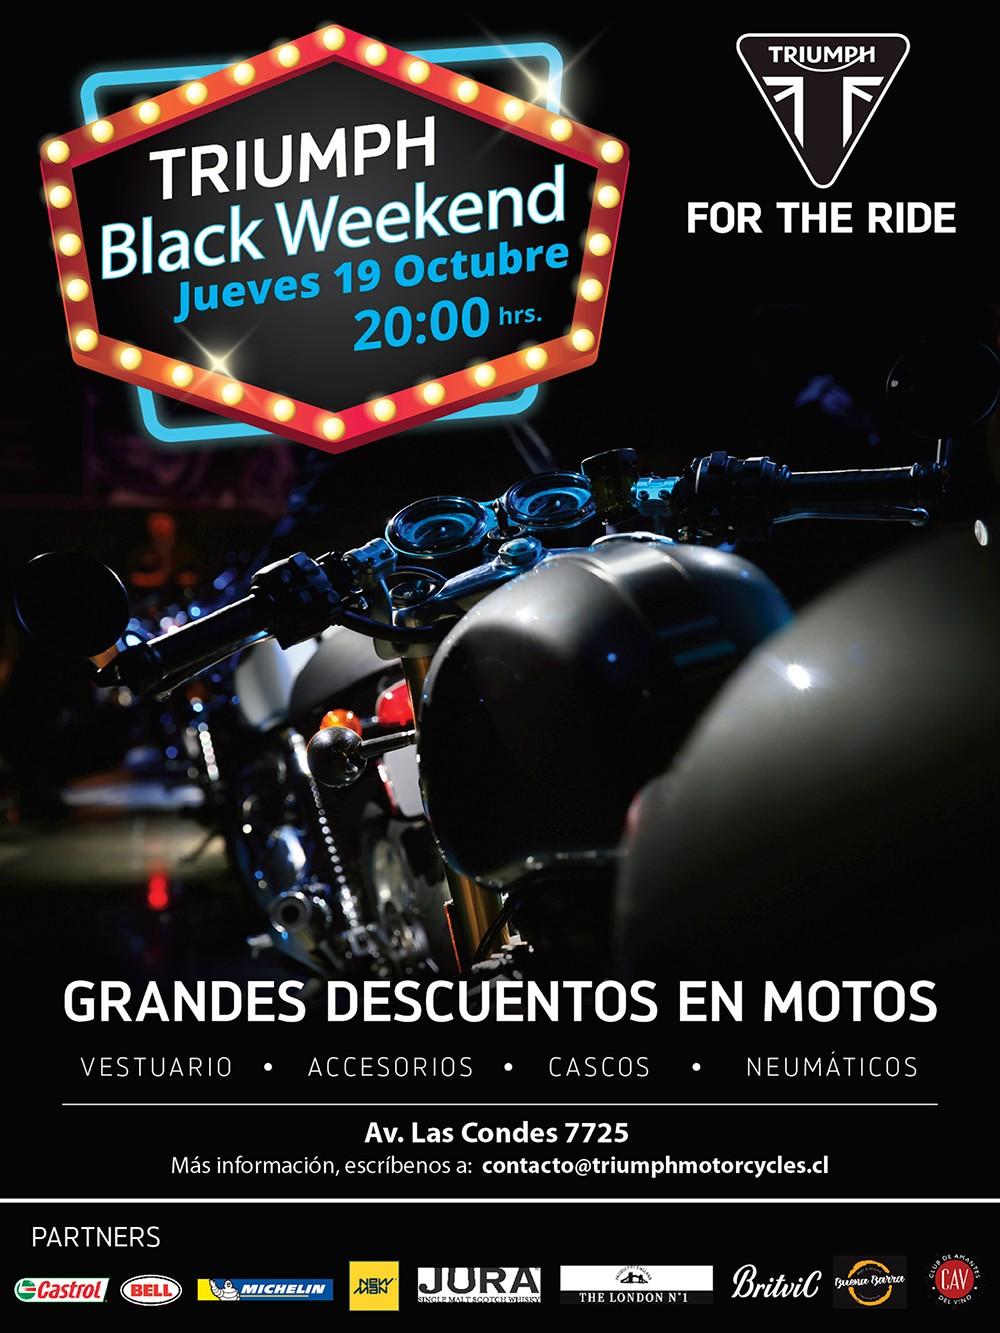 Triumph Black Weekend 2017